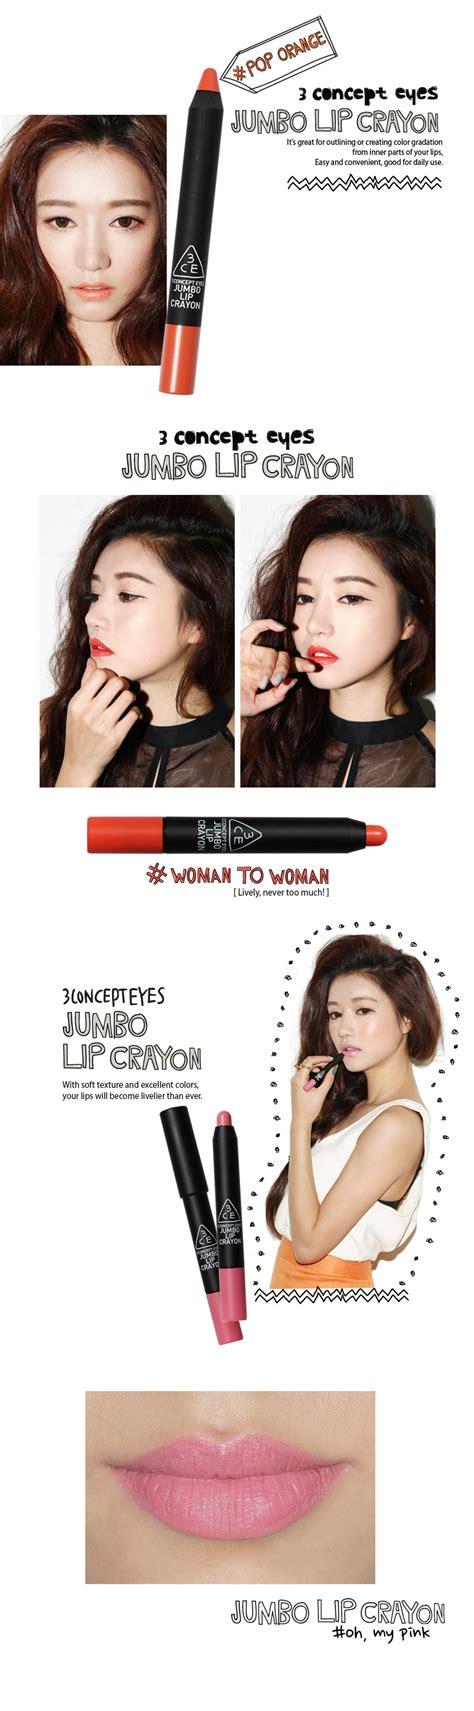 Images Jumbo Lip Crayon Lipstick B028 Soft 3ce 3 concept jumbo lip crayon lunatu cosmetics uk